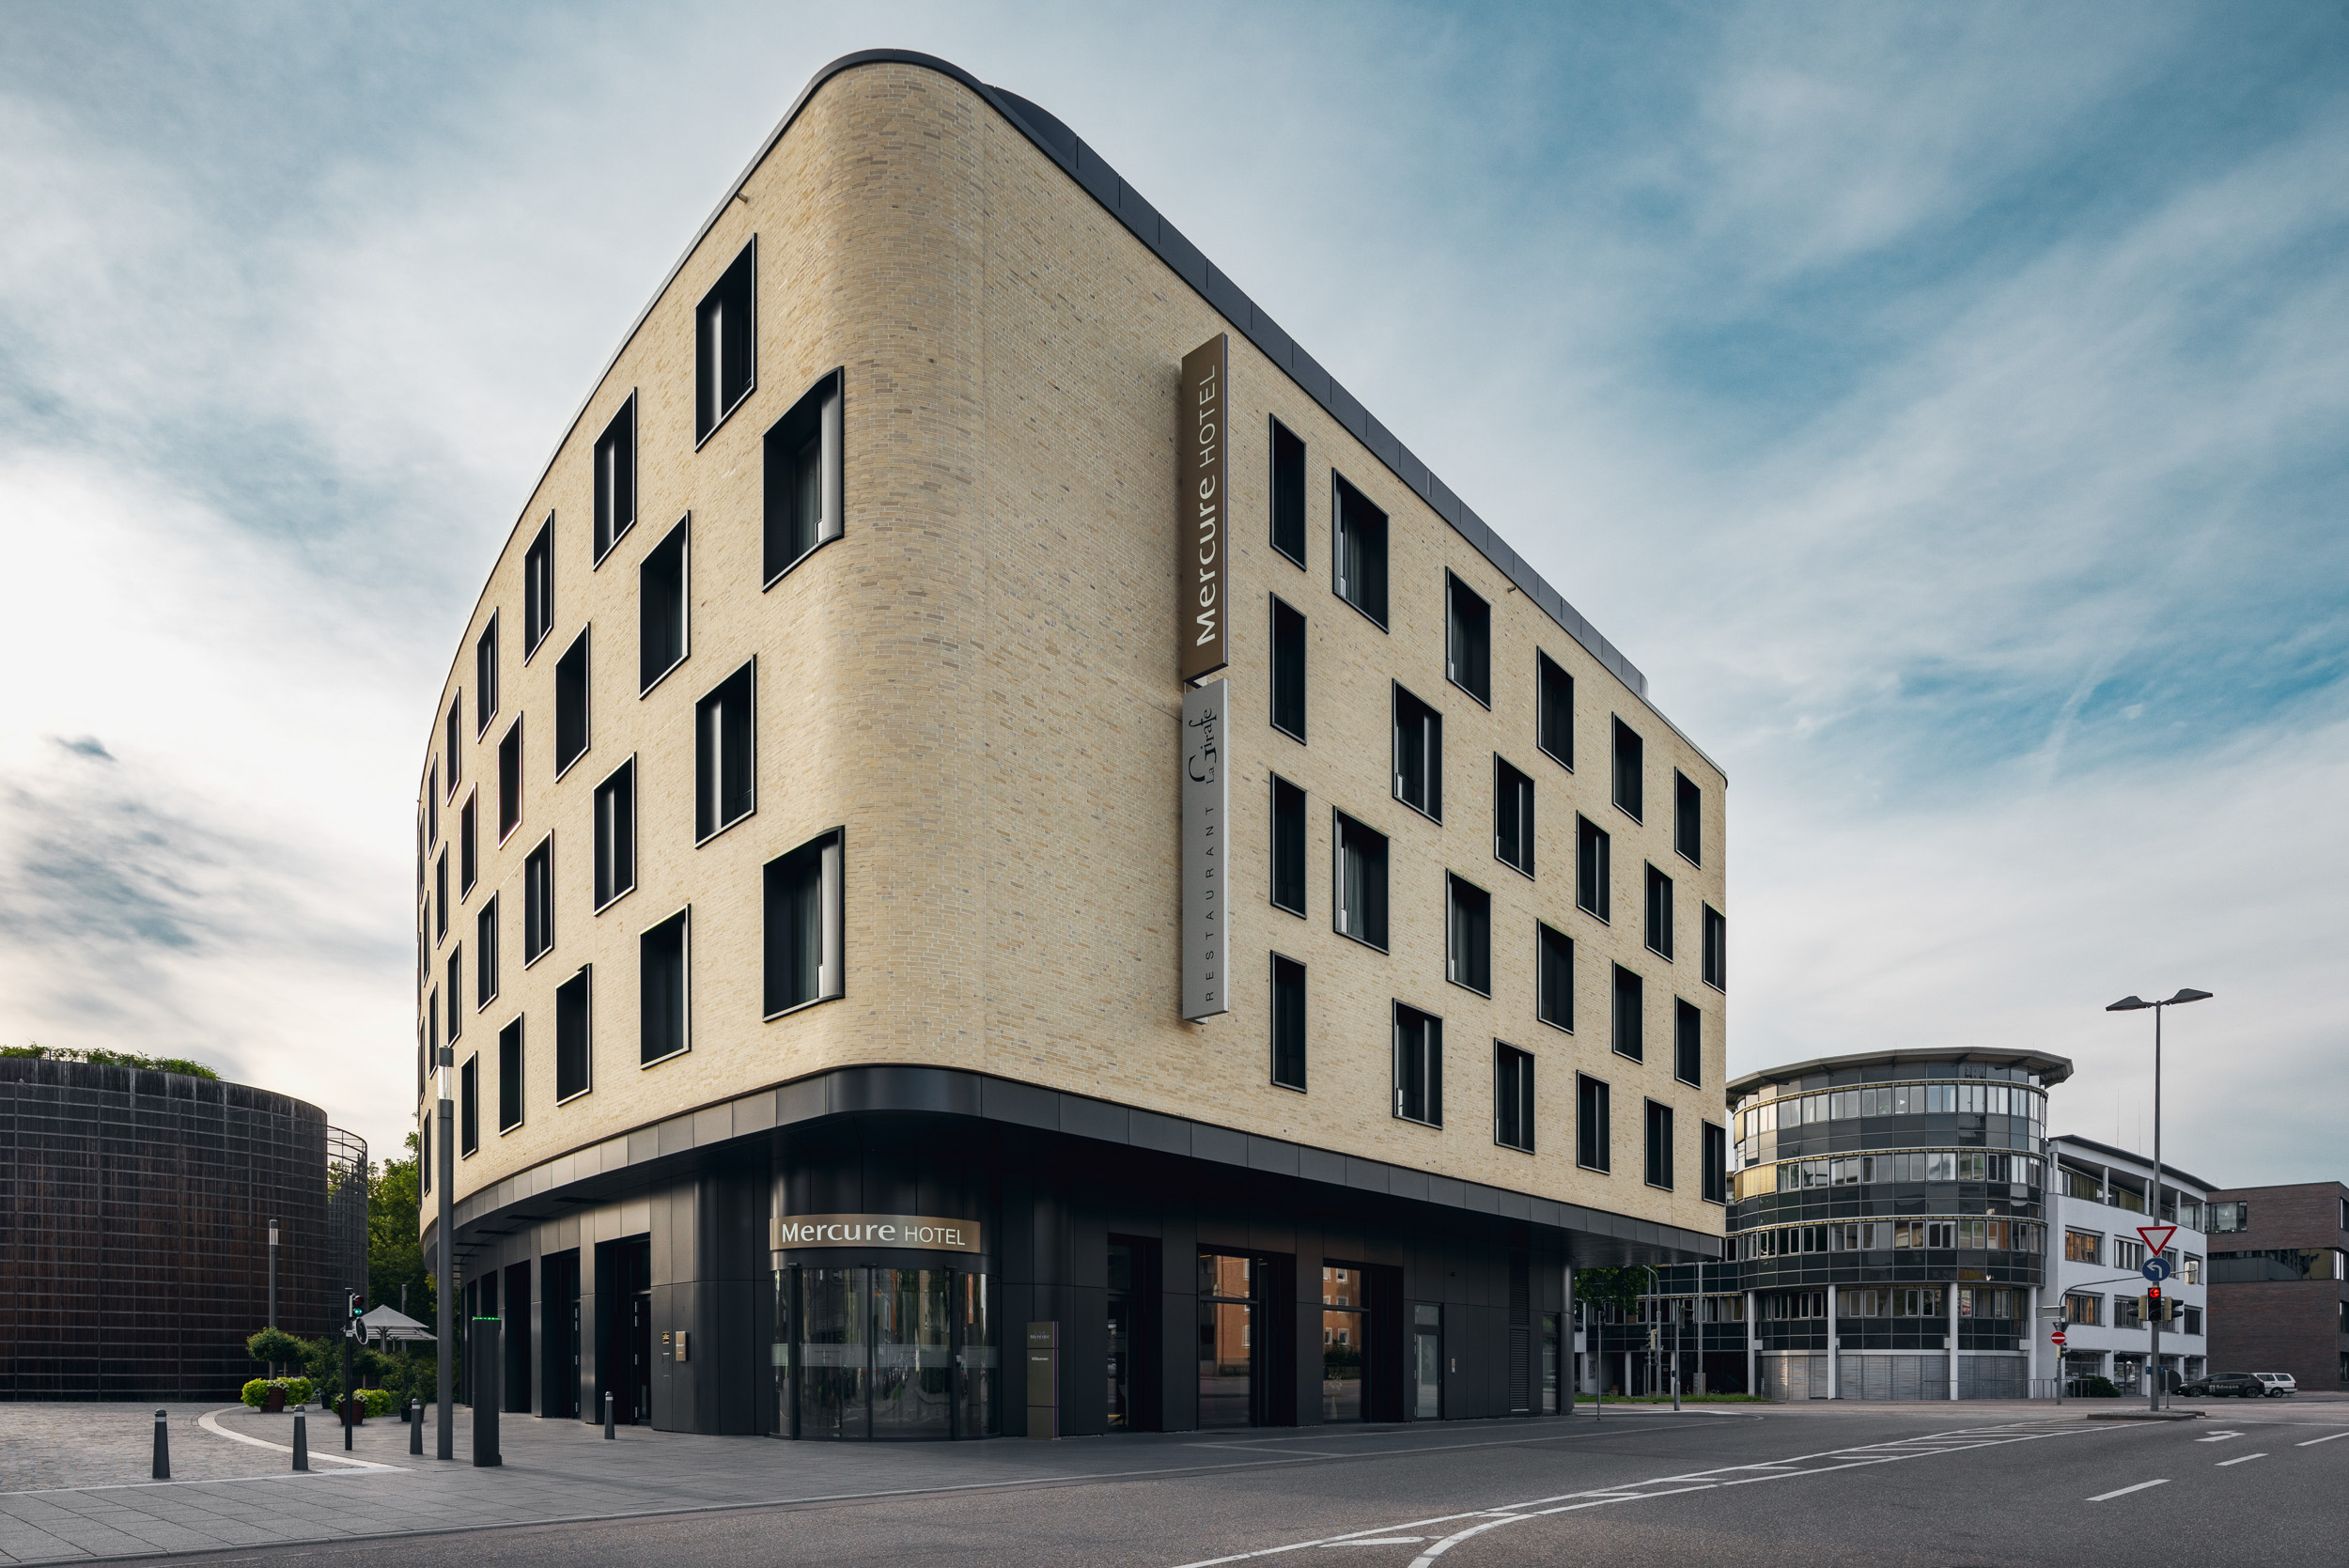 Gustav-Epple-Bauunternehmung-Hotel-Mercure-Heilbronn-MLX5455